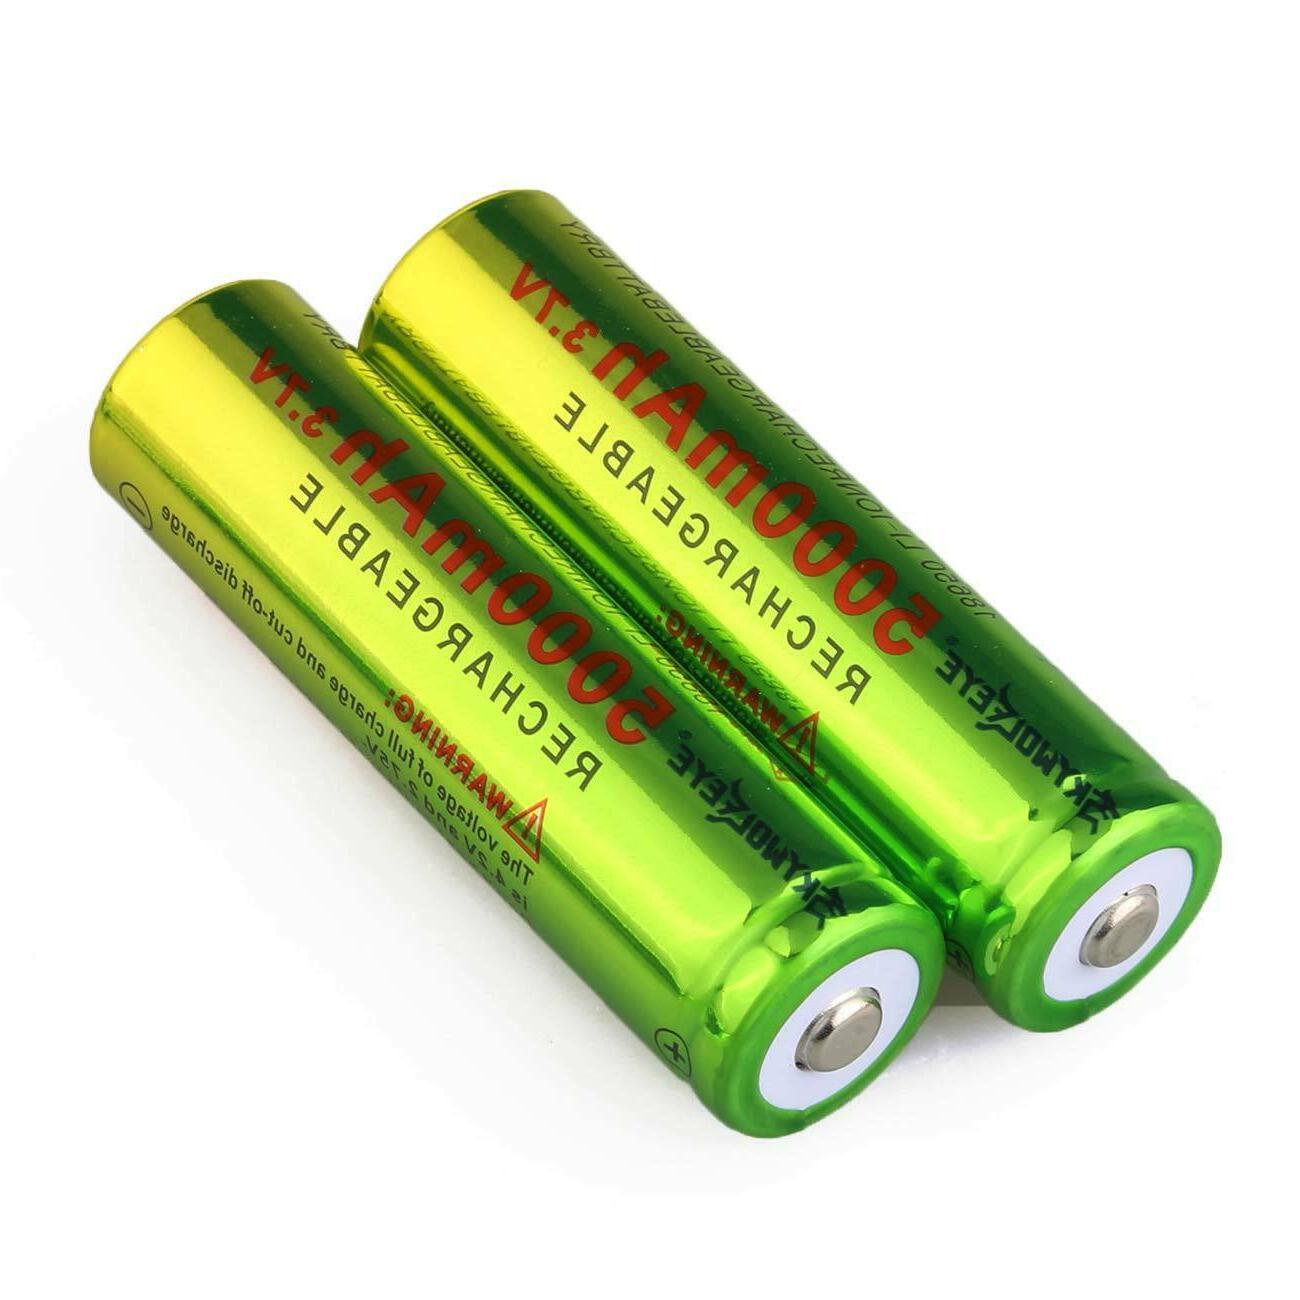 Lot 18650 Battery 5000mAh Li-ion Rechargeable Batteries USA